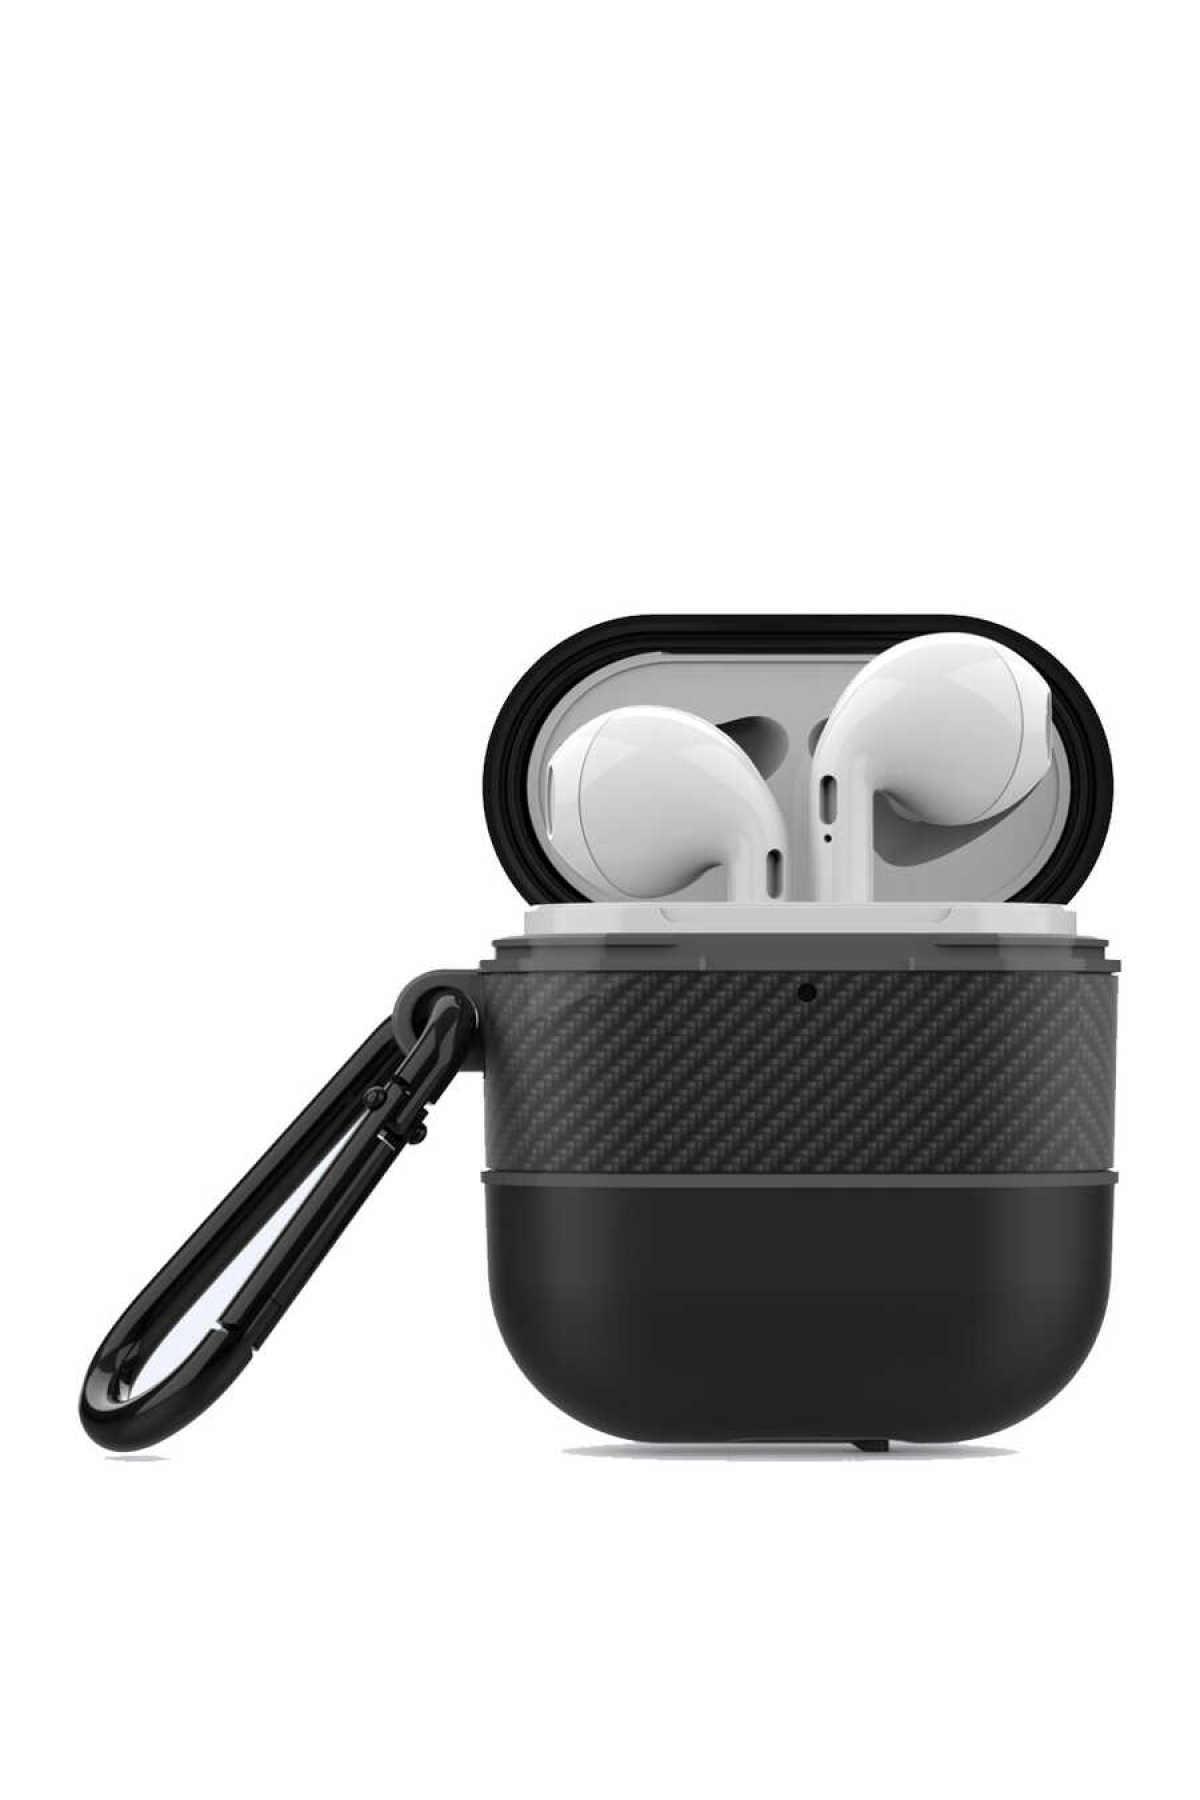 zore Apple Airpods Kılıf Airbag 16 Zırh Su Geçirmez Askılı Şarj Kutusu Koruyucu 1